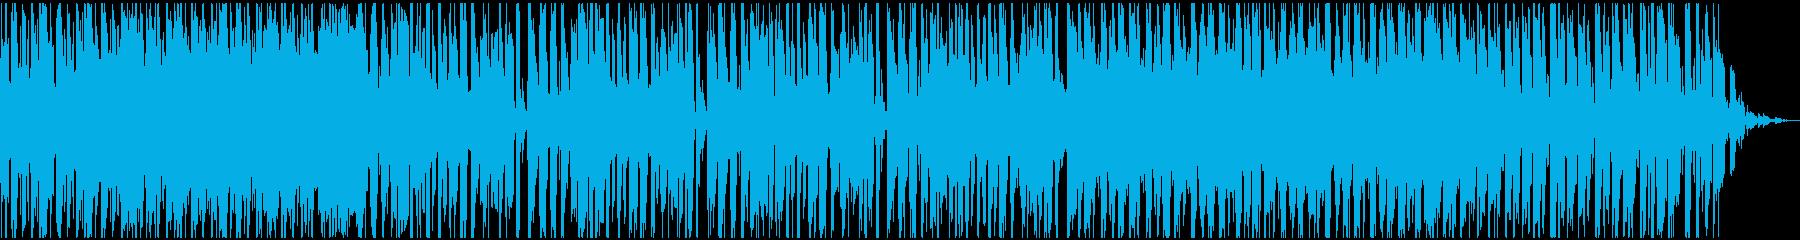 disco houseの再生済みの波形